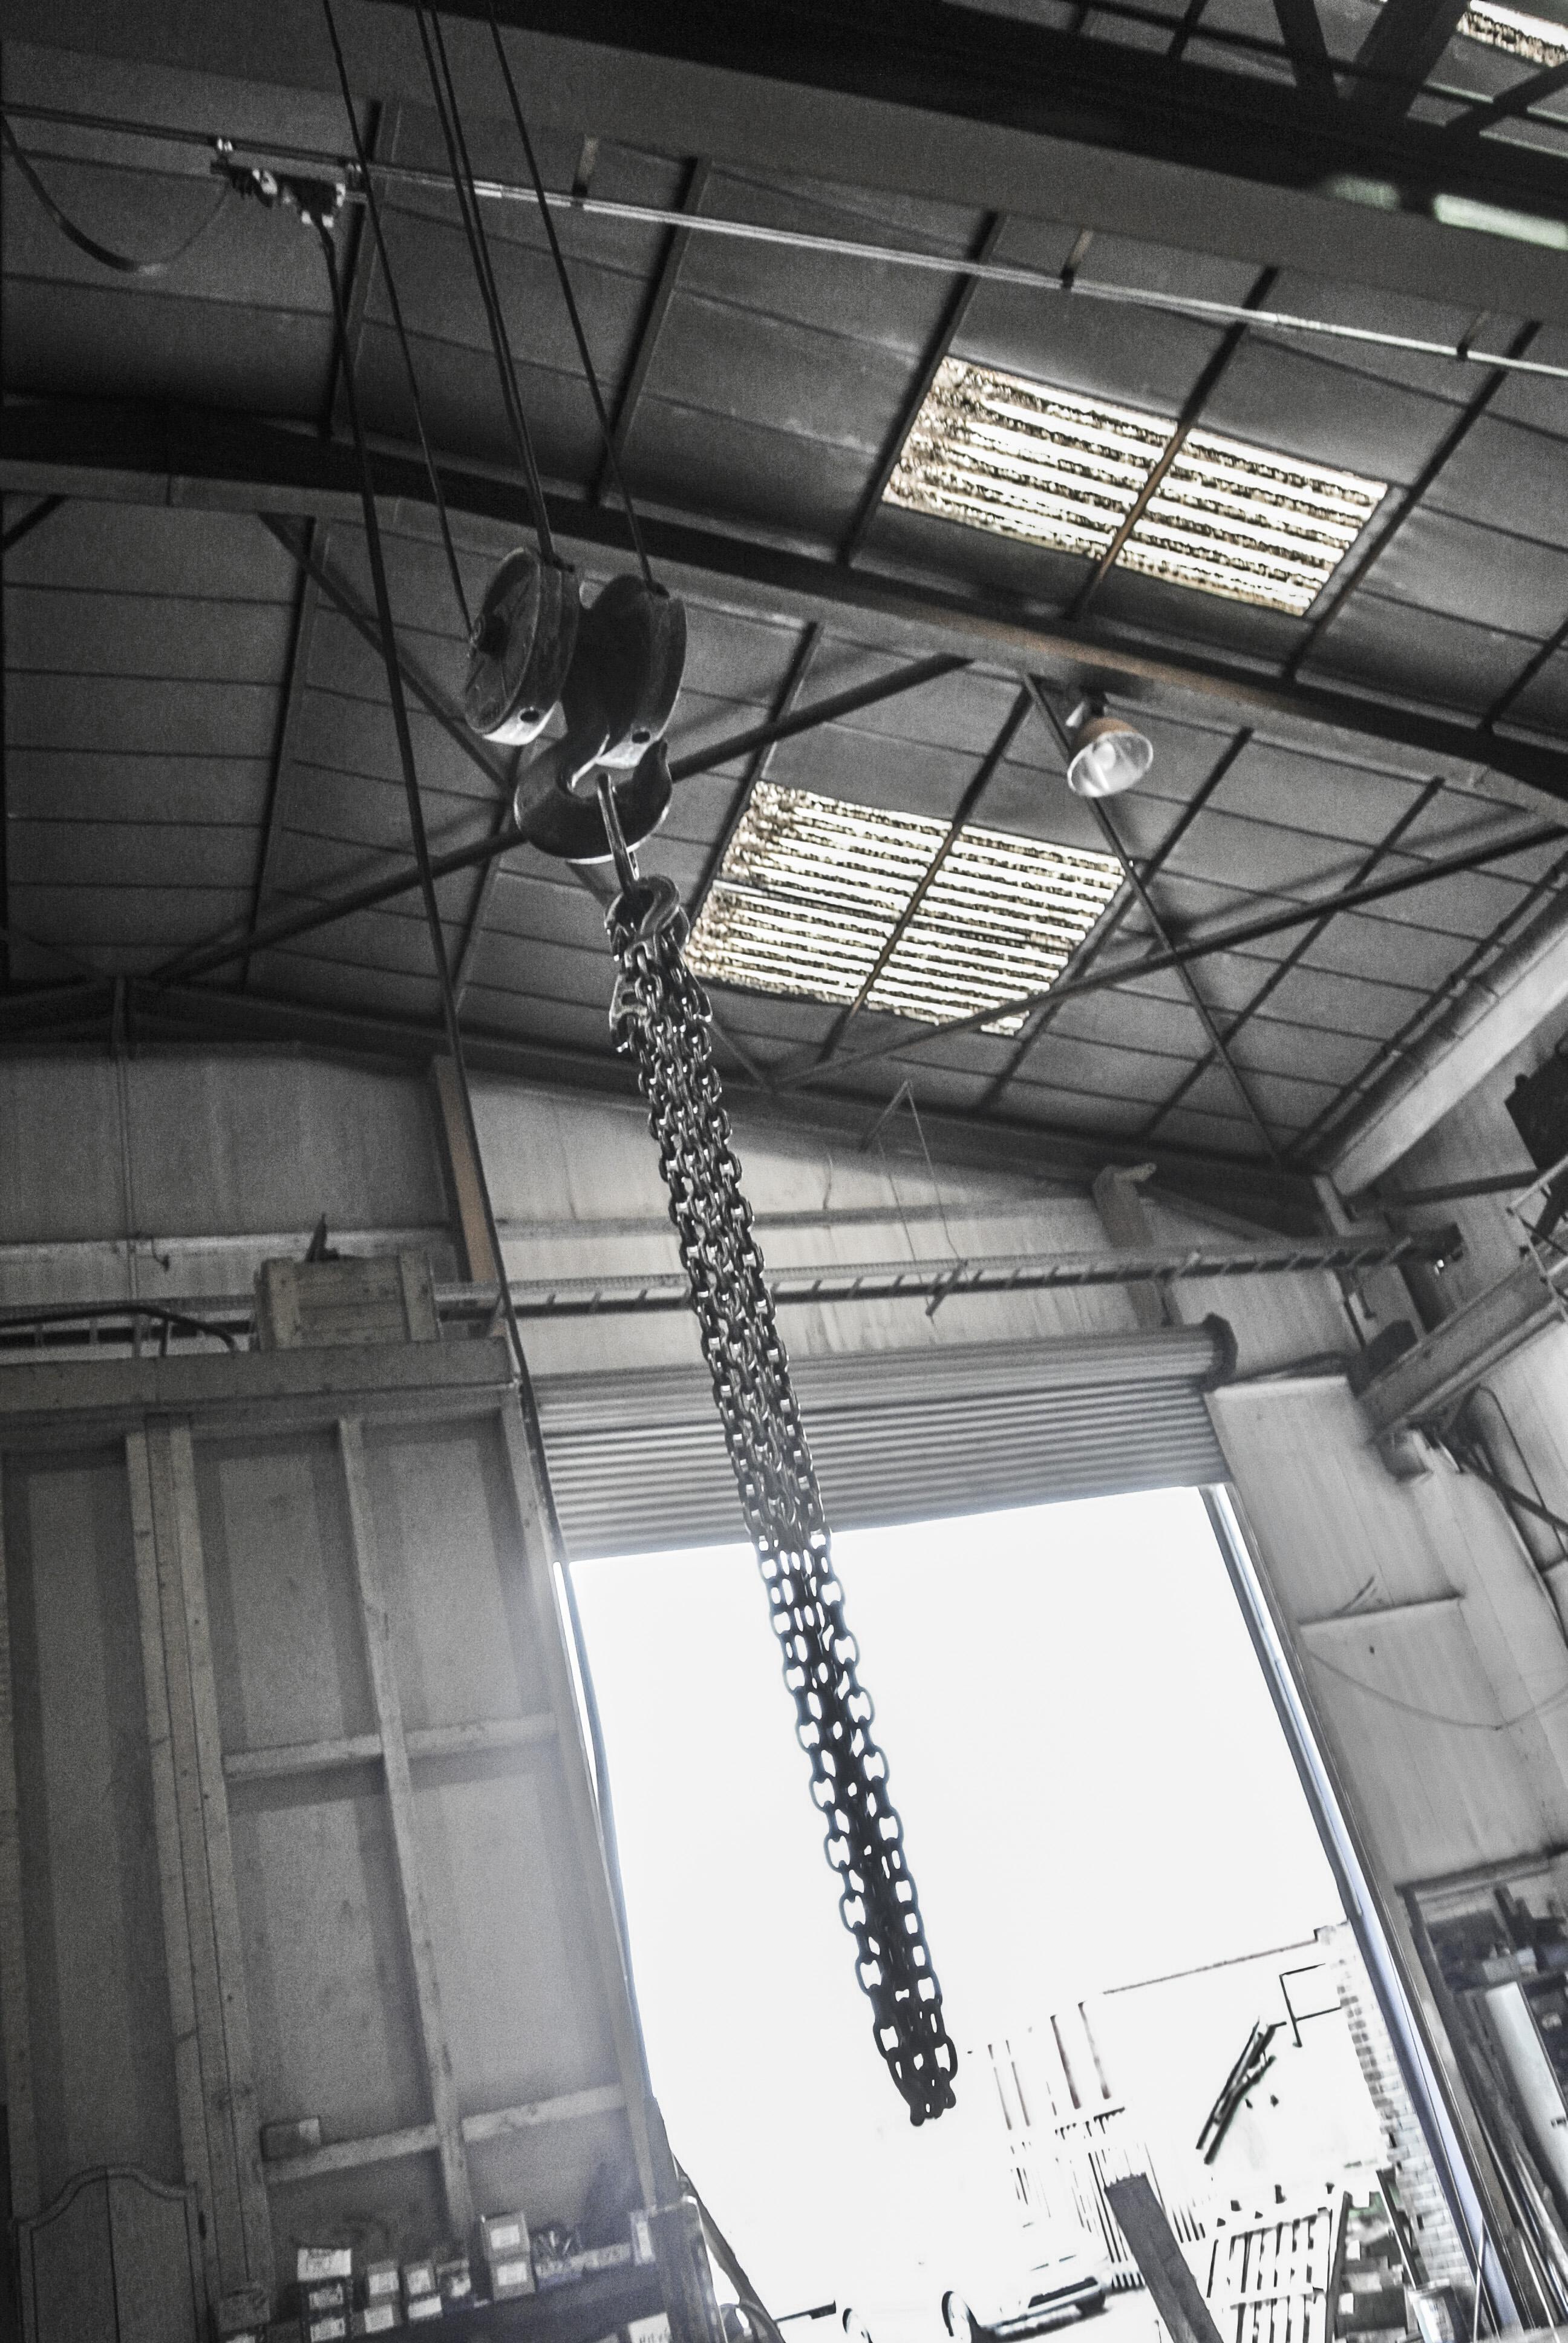 Hook Lift B&W 1.jpg